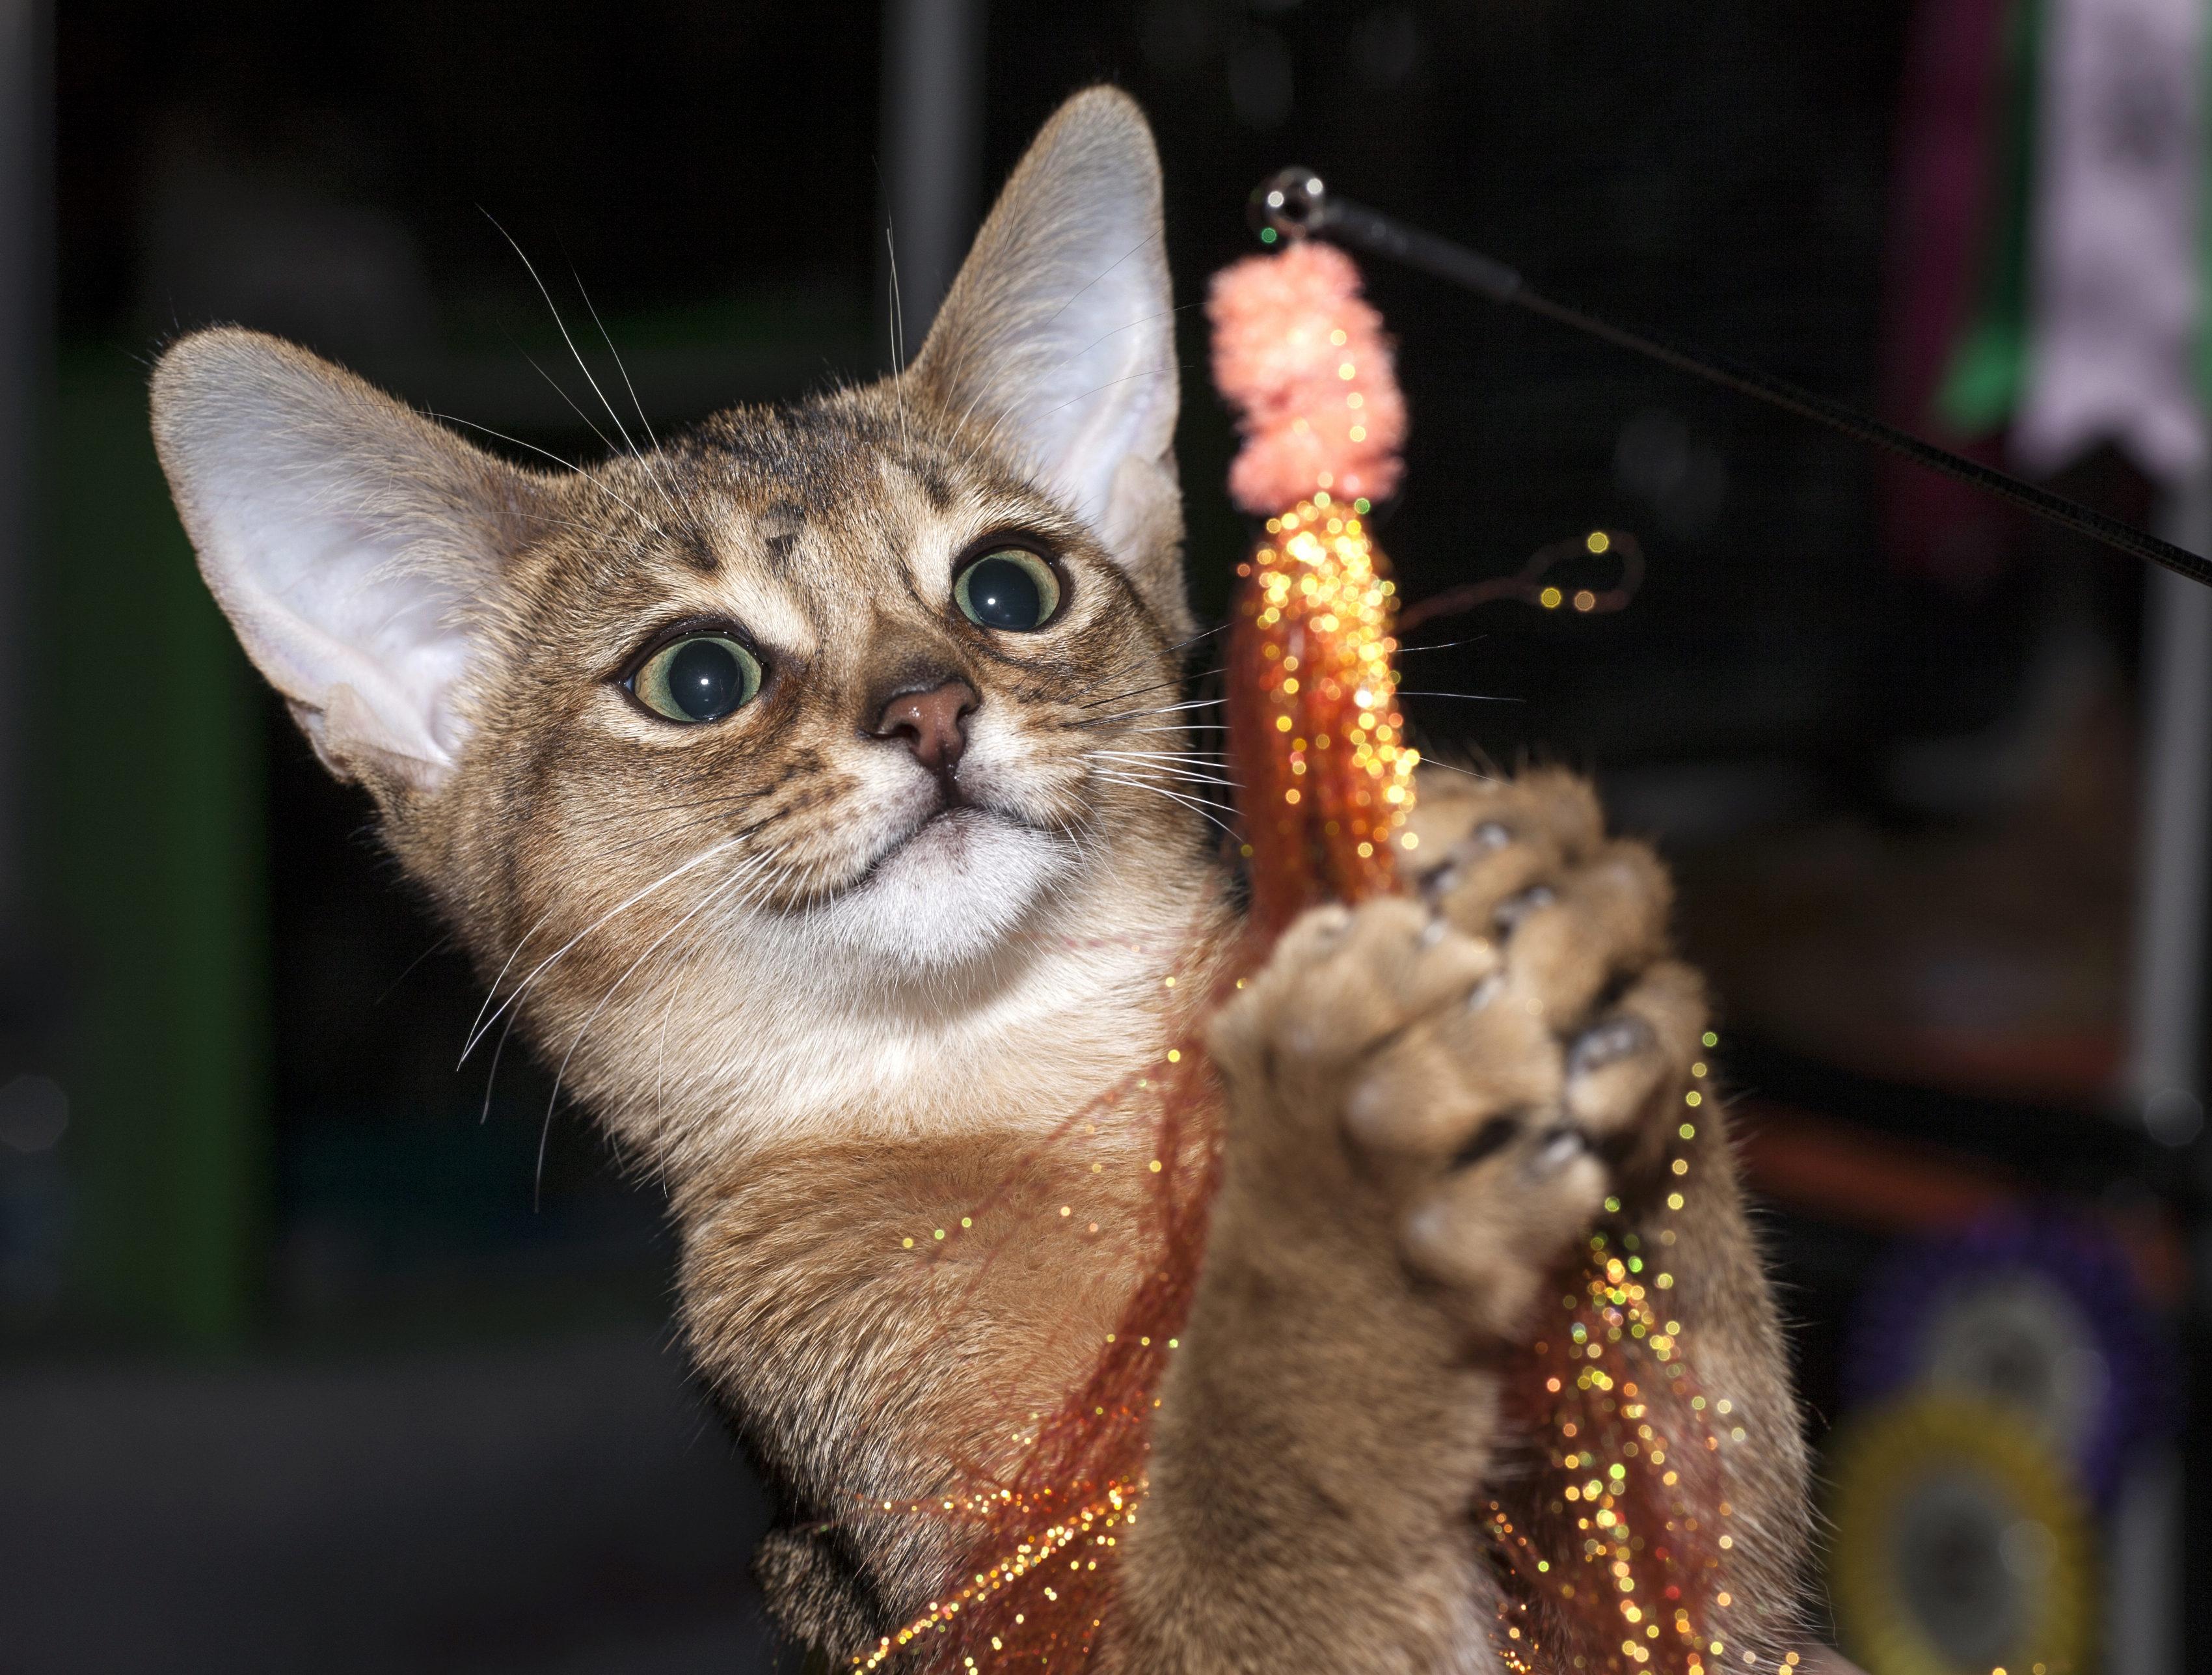 О абиссинской породе кошек